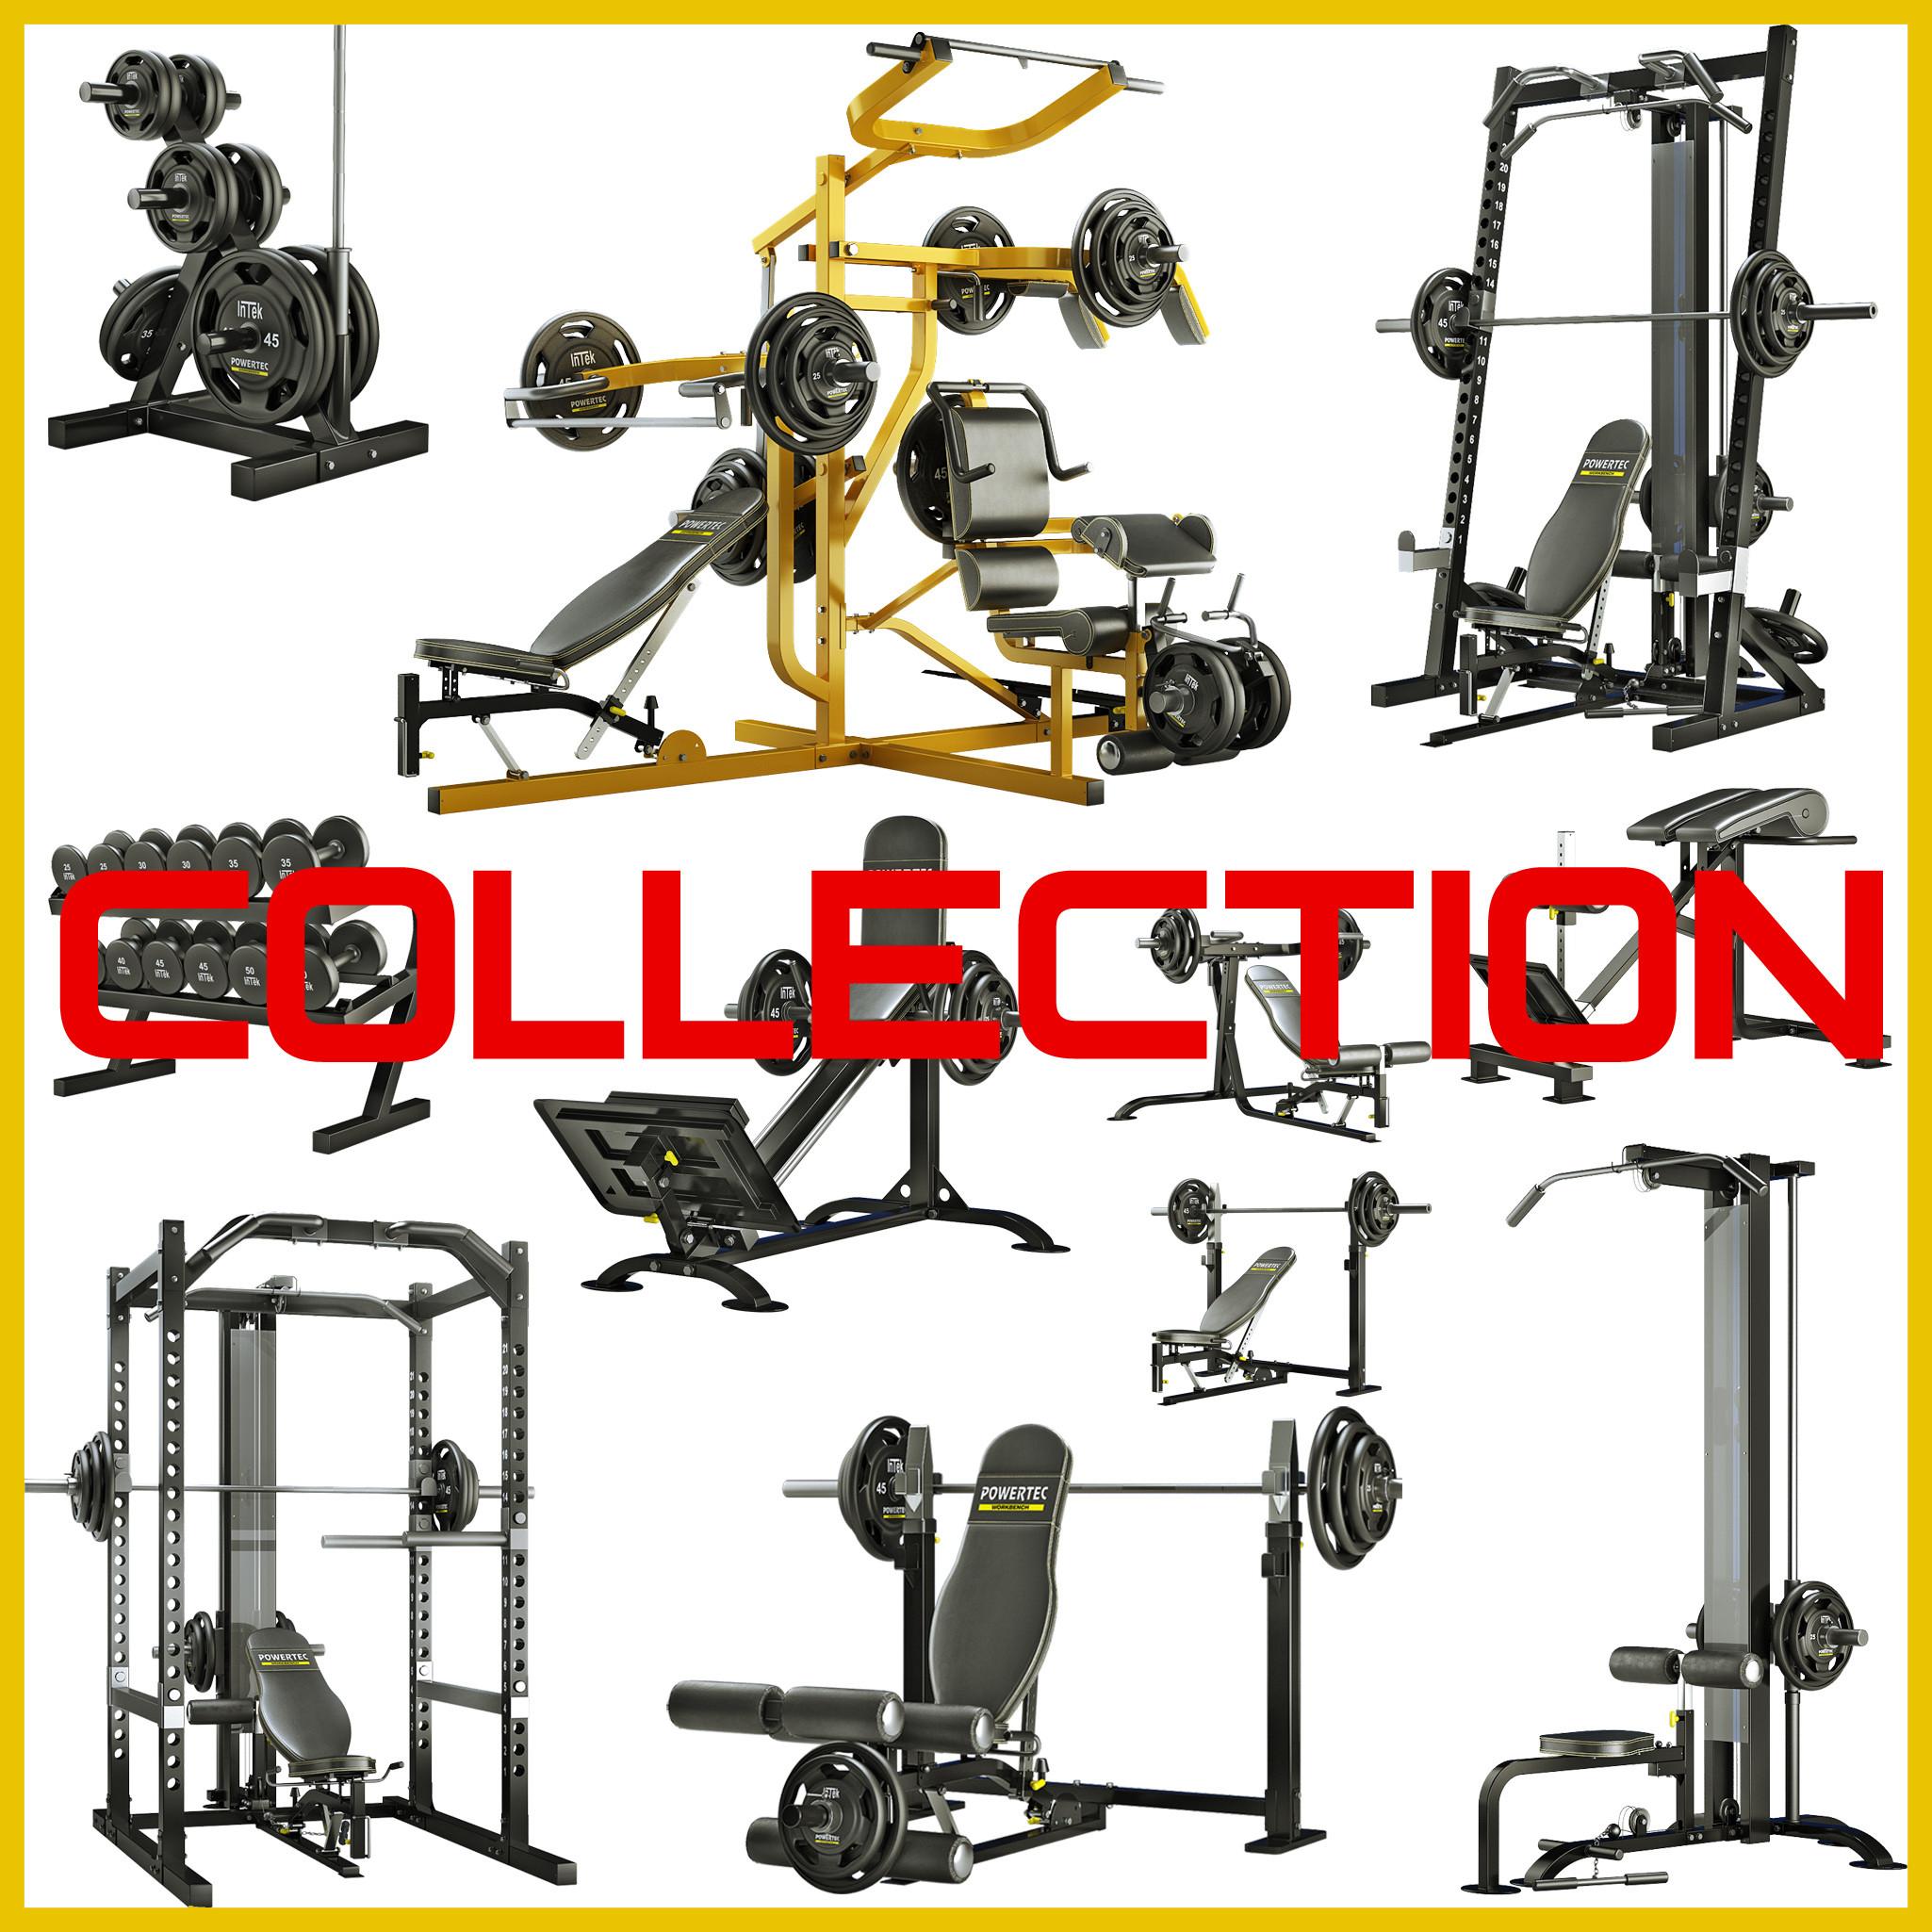 Powertec_BIG_Collection_logo.jpg